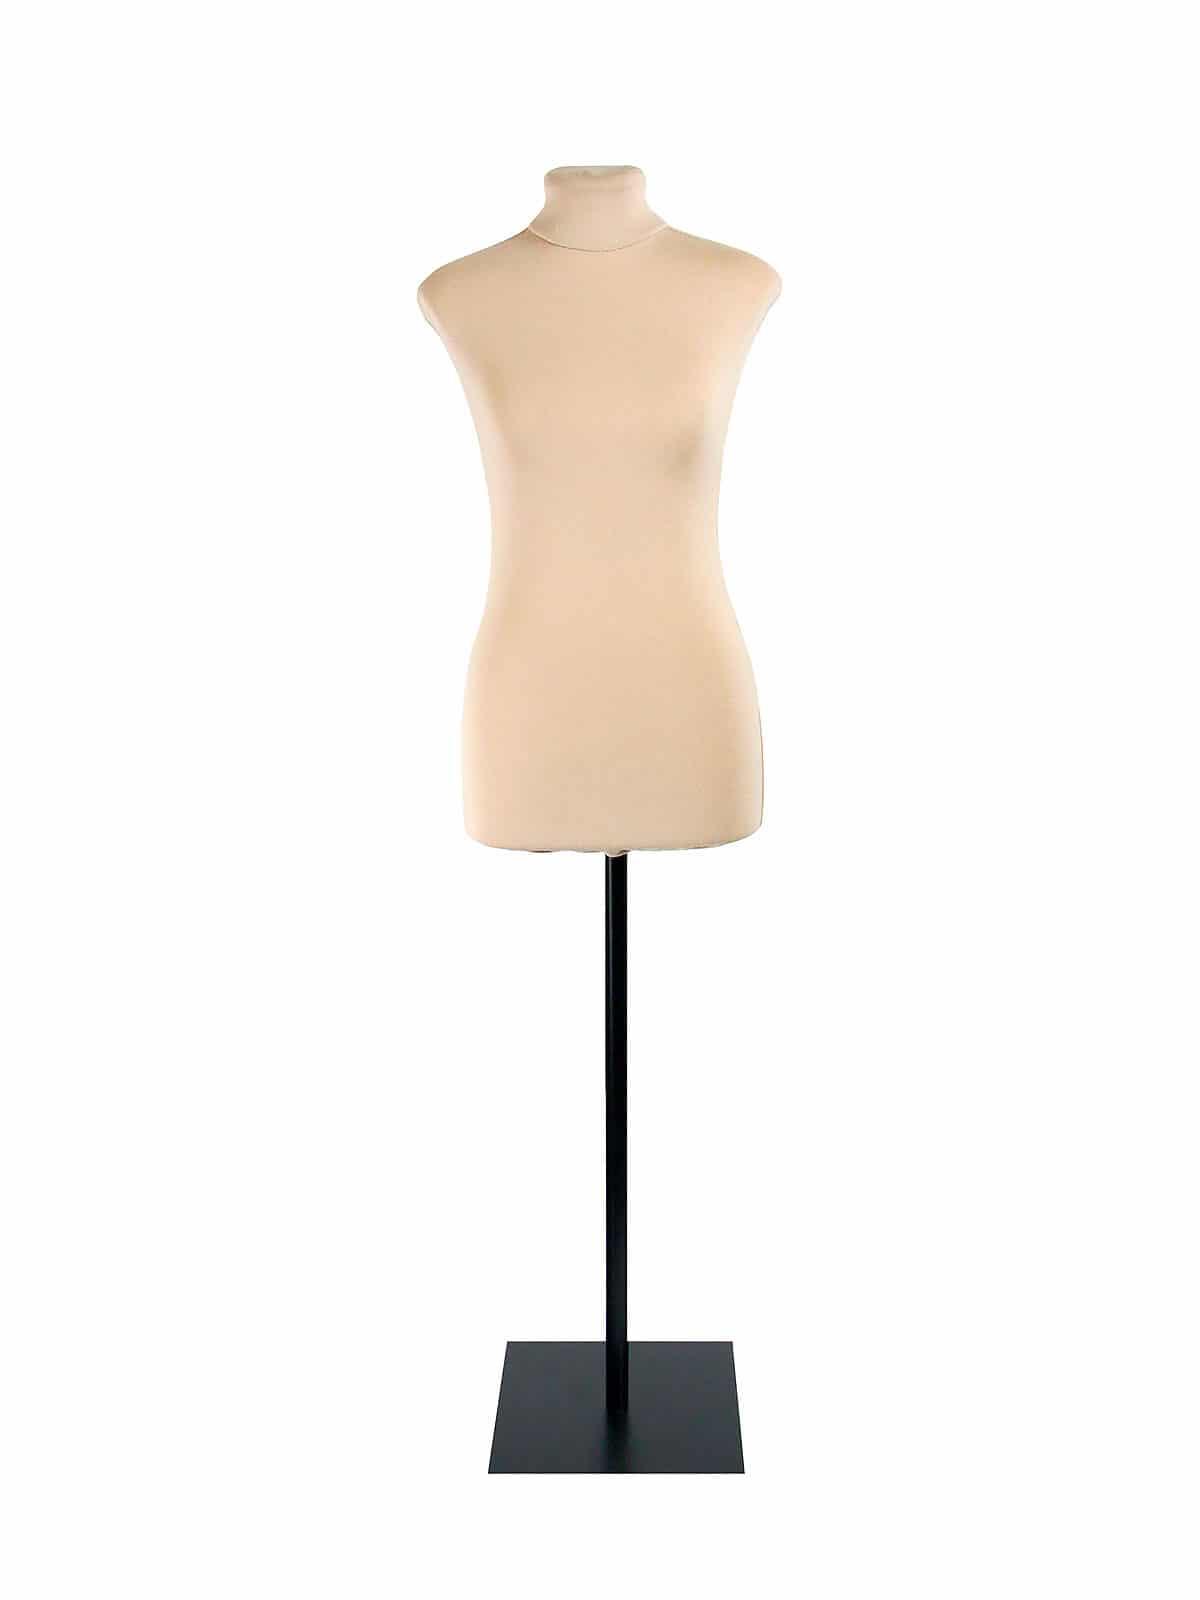 Мягкий портновский масштабный манекен Betty стандарт, бежевый